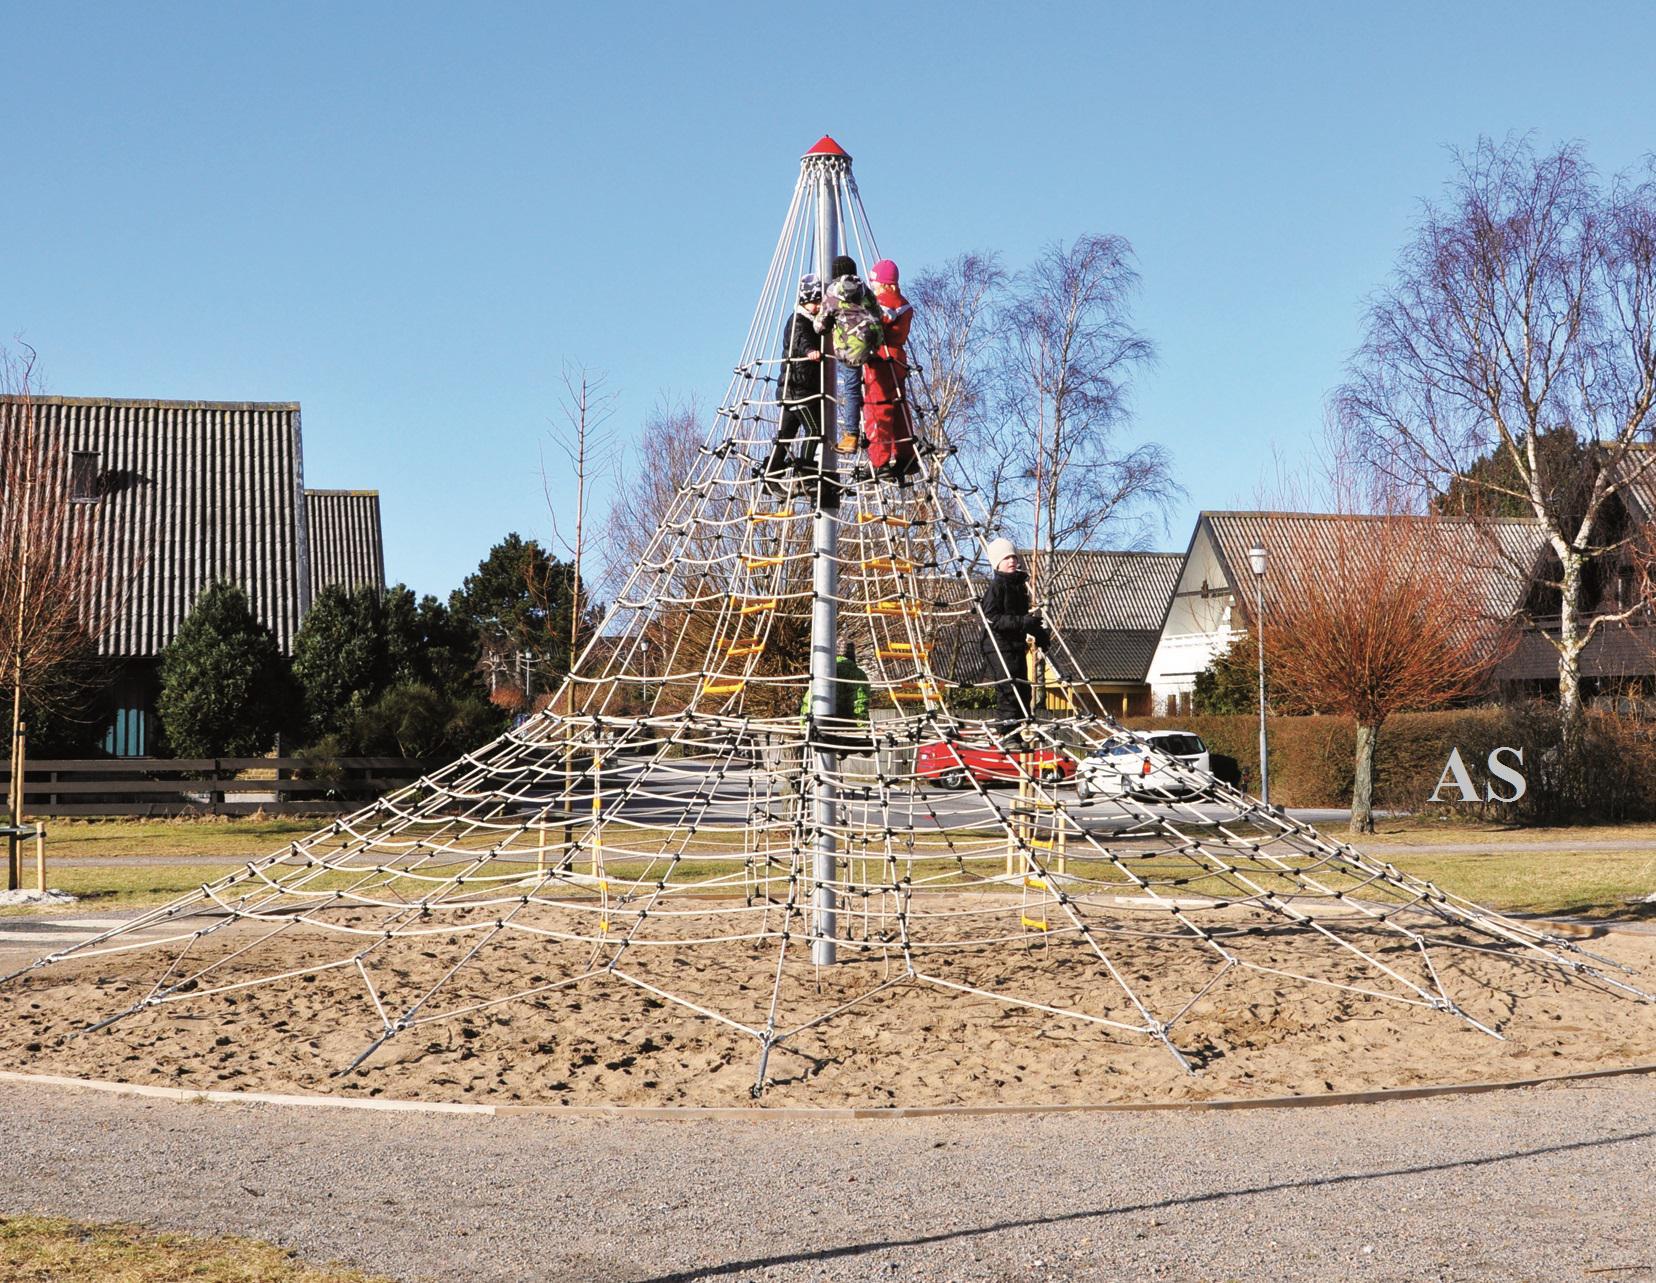 Klettergerüst Pyramide : Grundschule adelsried bonstetten auf die pyramide fertig los